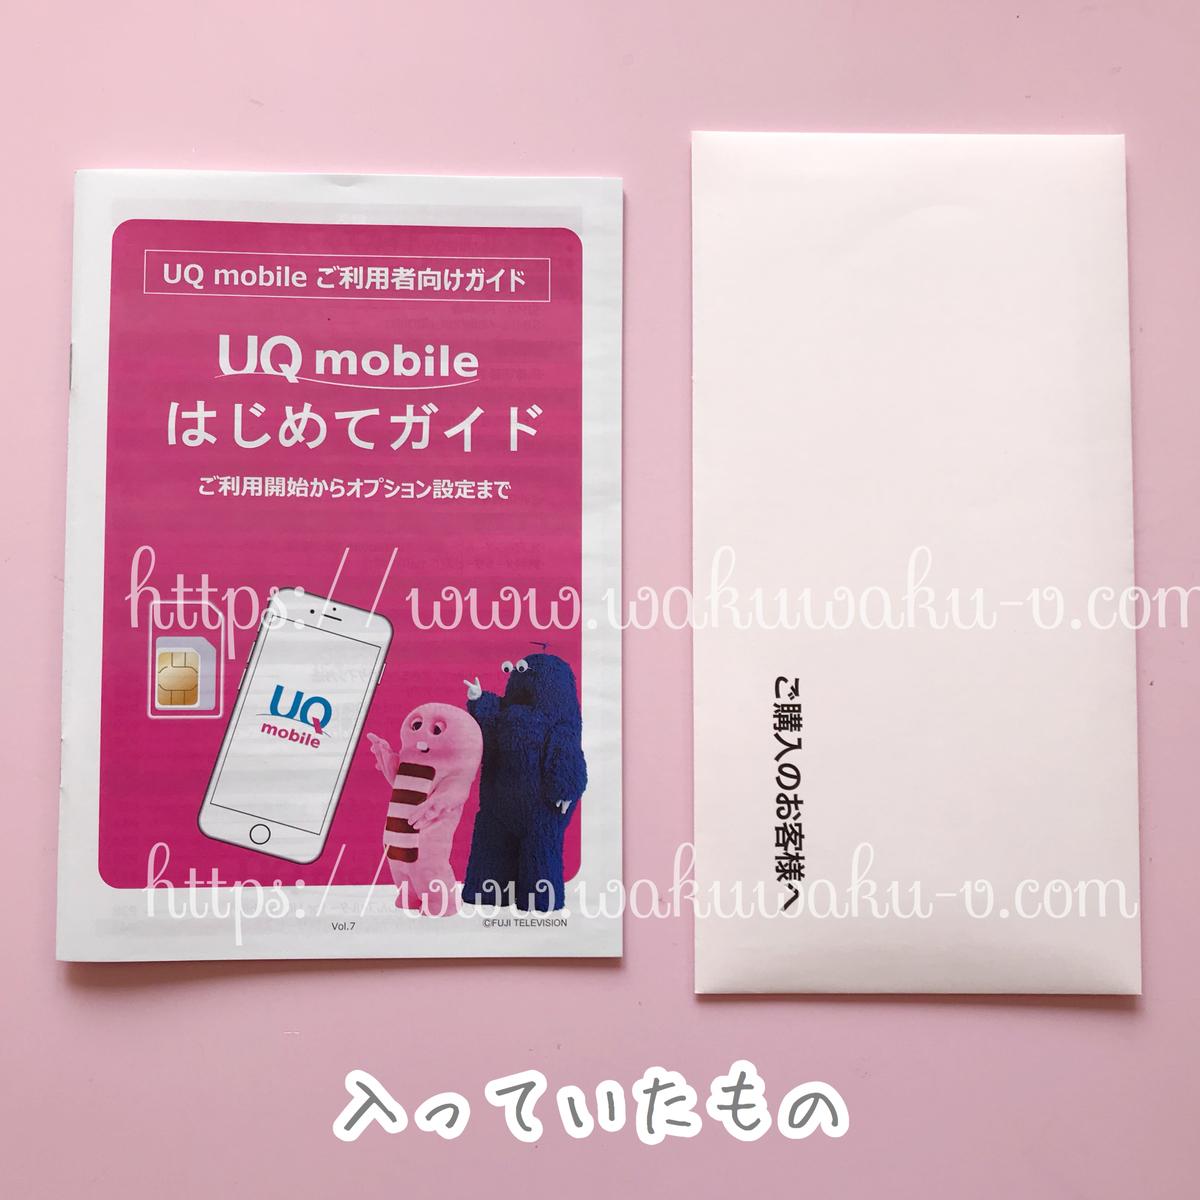 UQ 口コミ おすすめ レビュー 設定 iPhone7 au